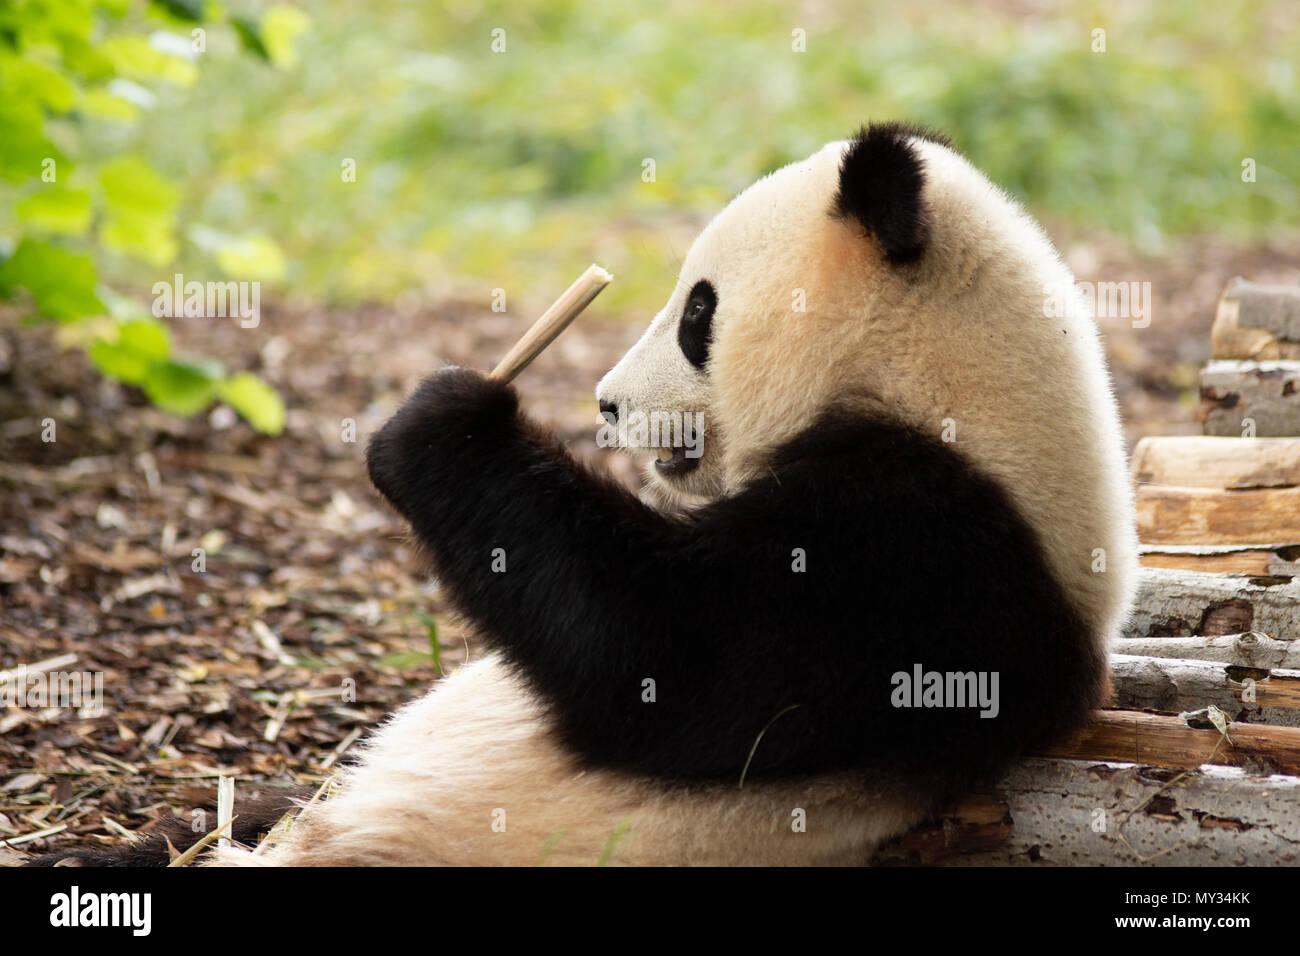 Orso panda in Pairi Daiza zoo,Belgio Foto Stock